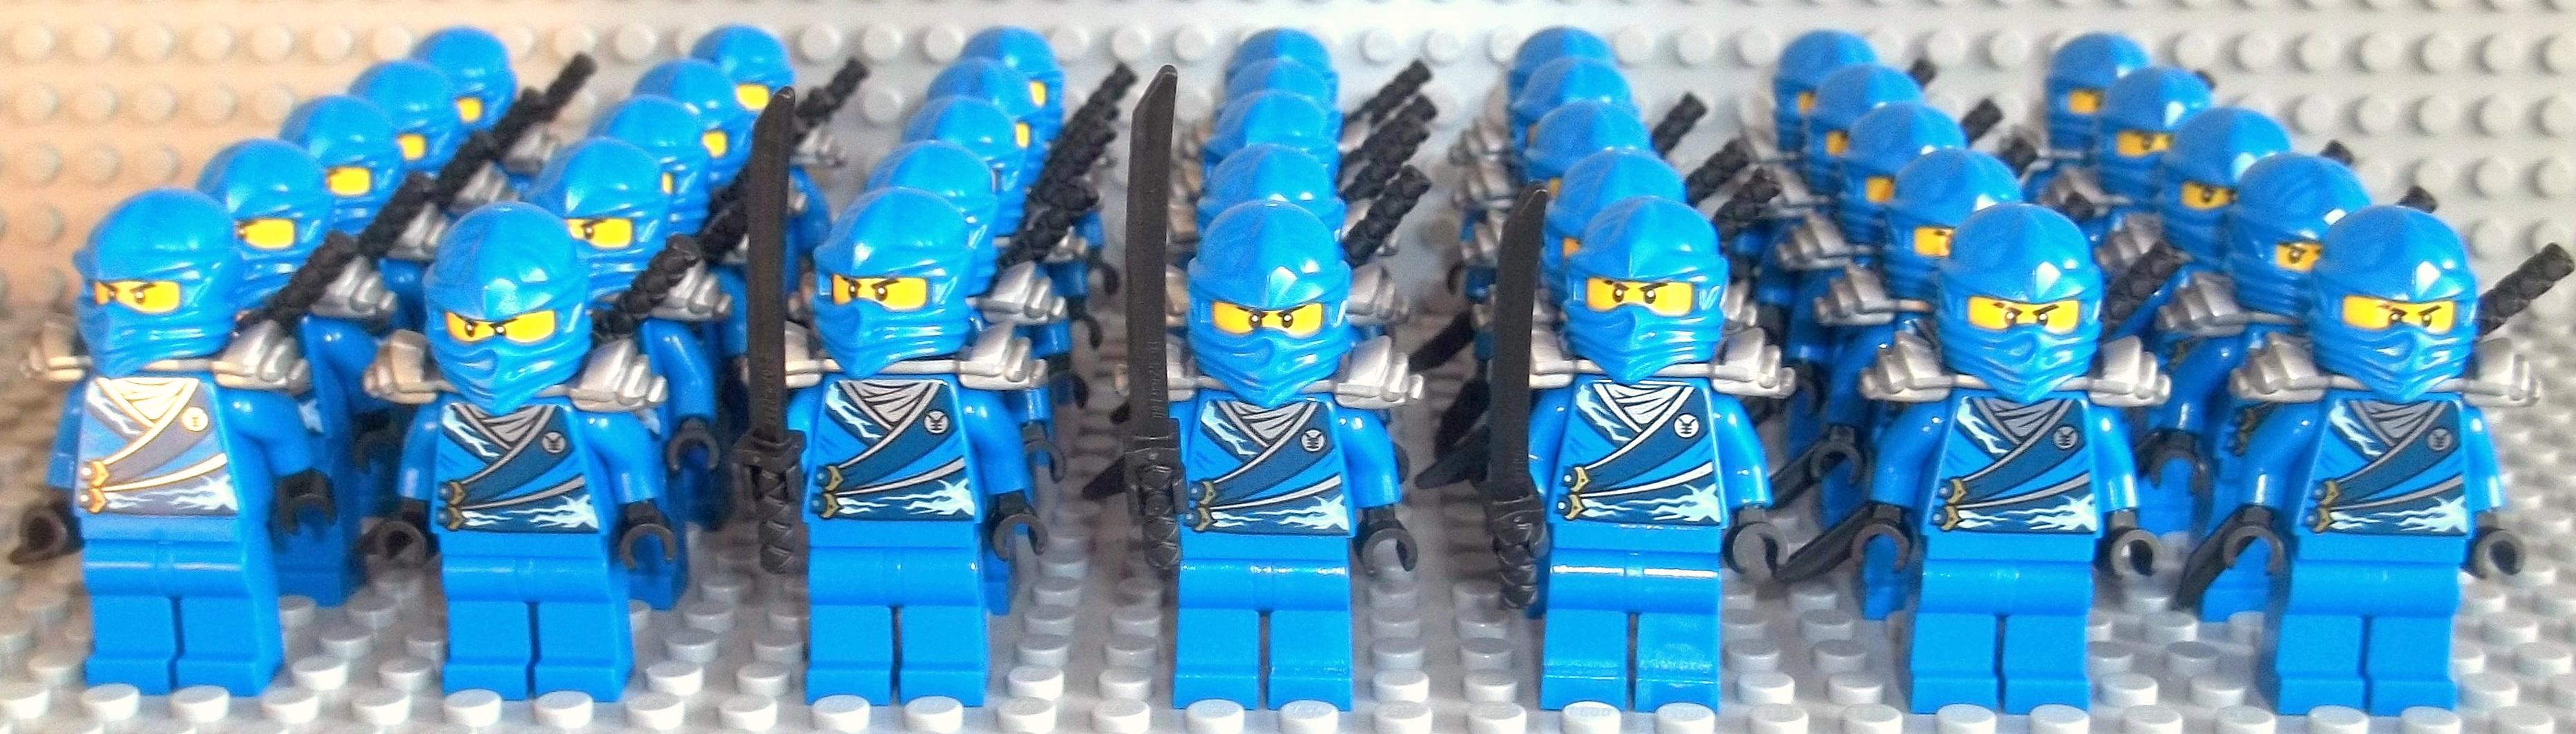 Gurus Baustein Tempel - Ninjago Figuren